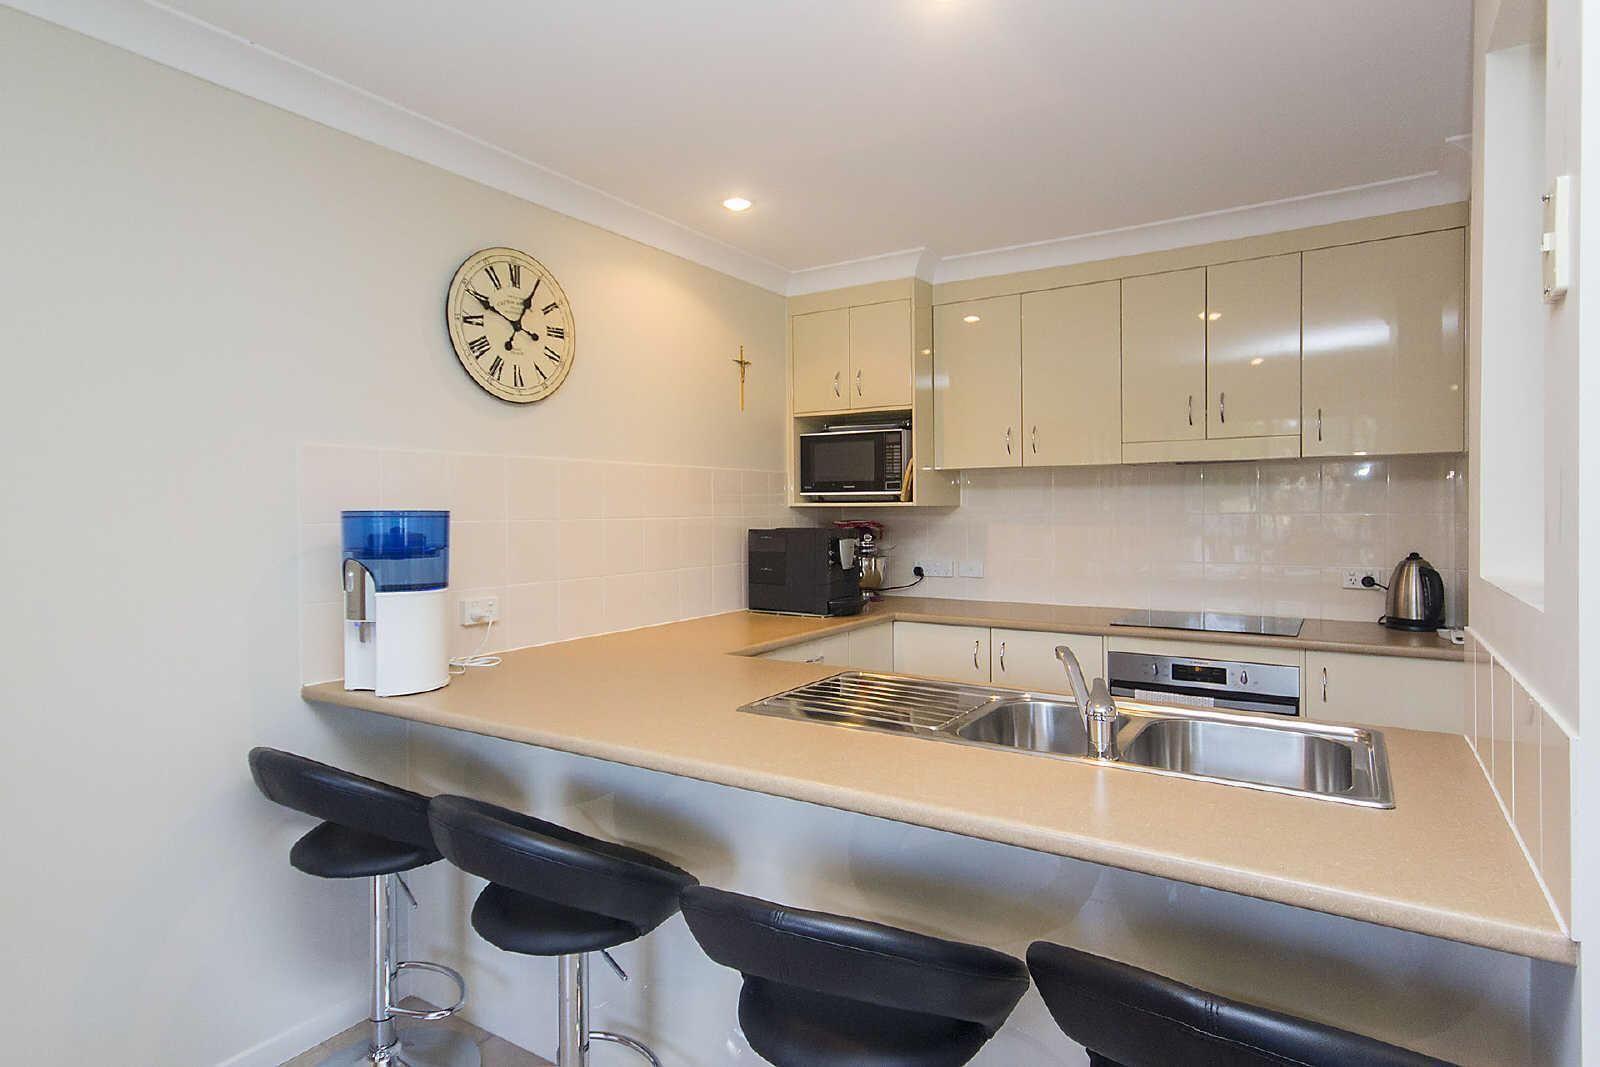 2/5 Schmarr Avenue, Upper Coomera QLD 4209, Image 2